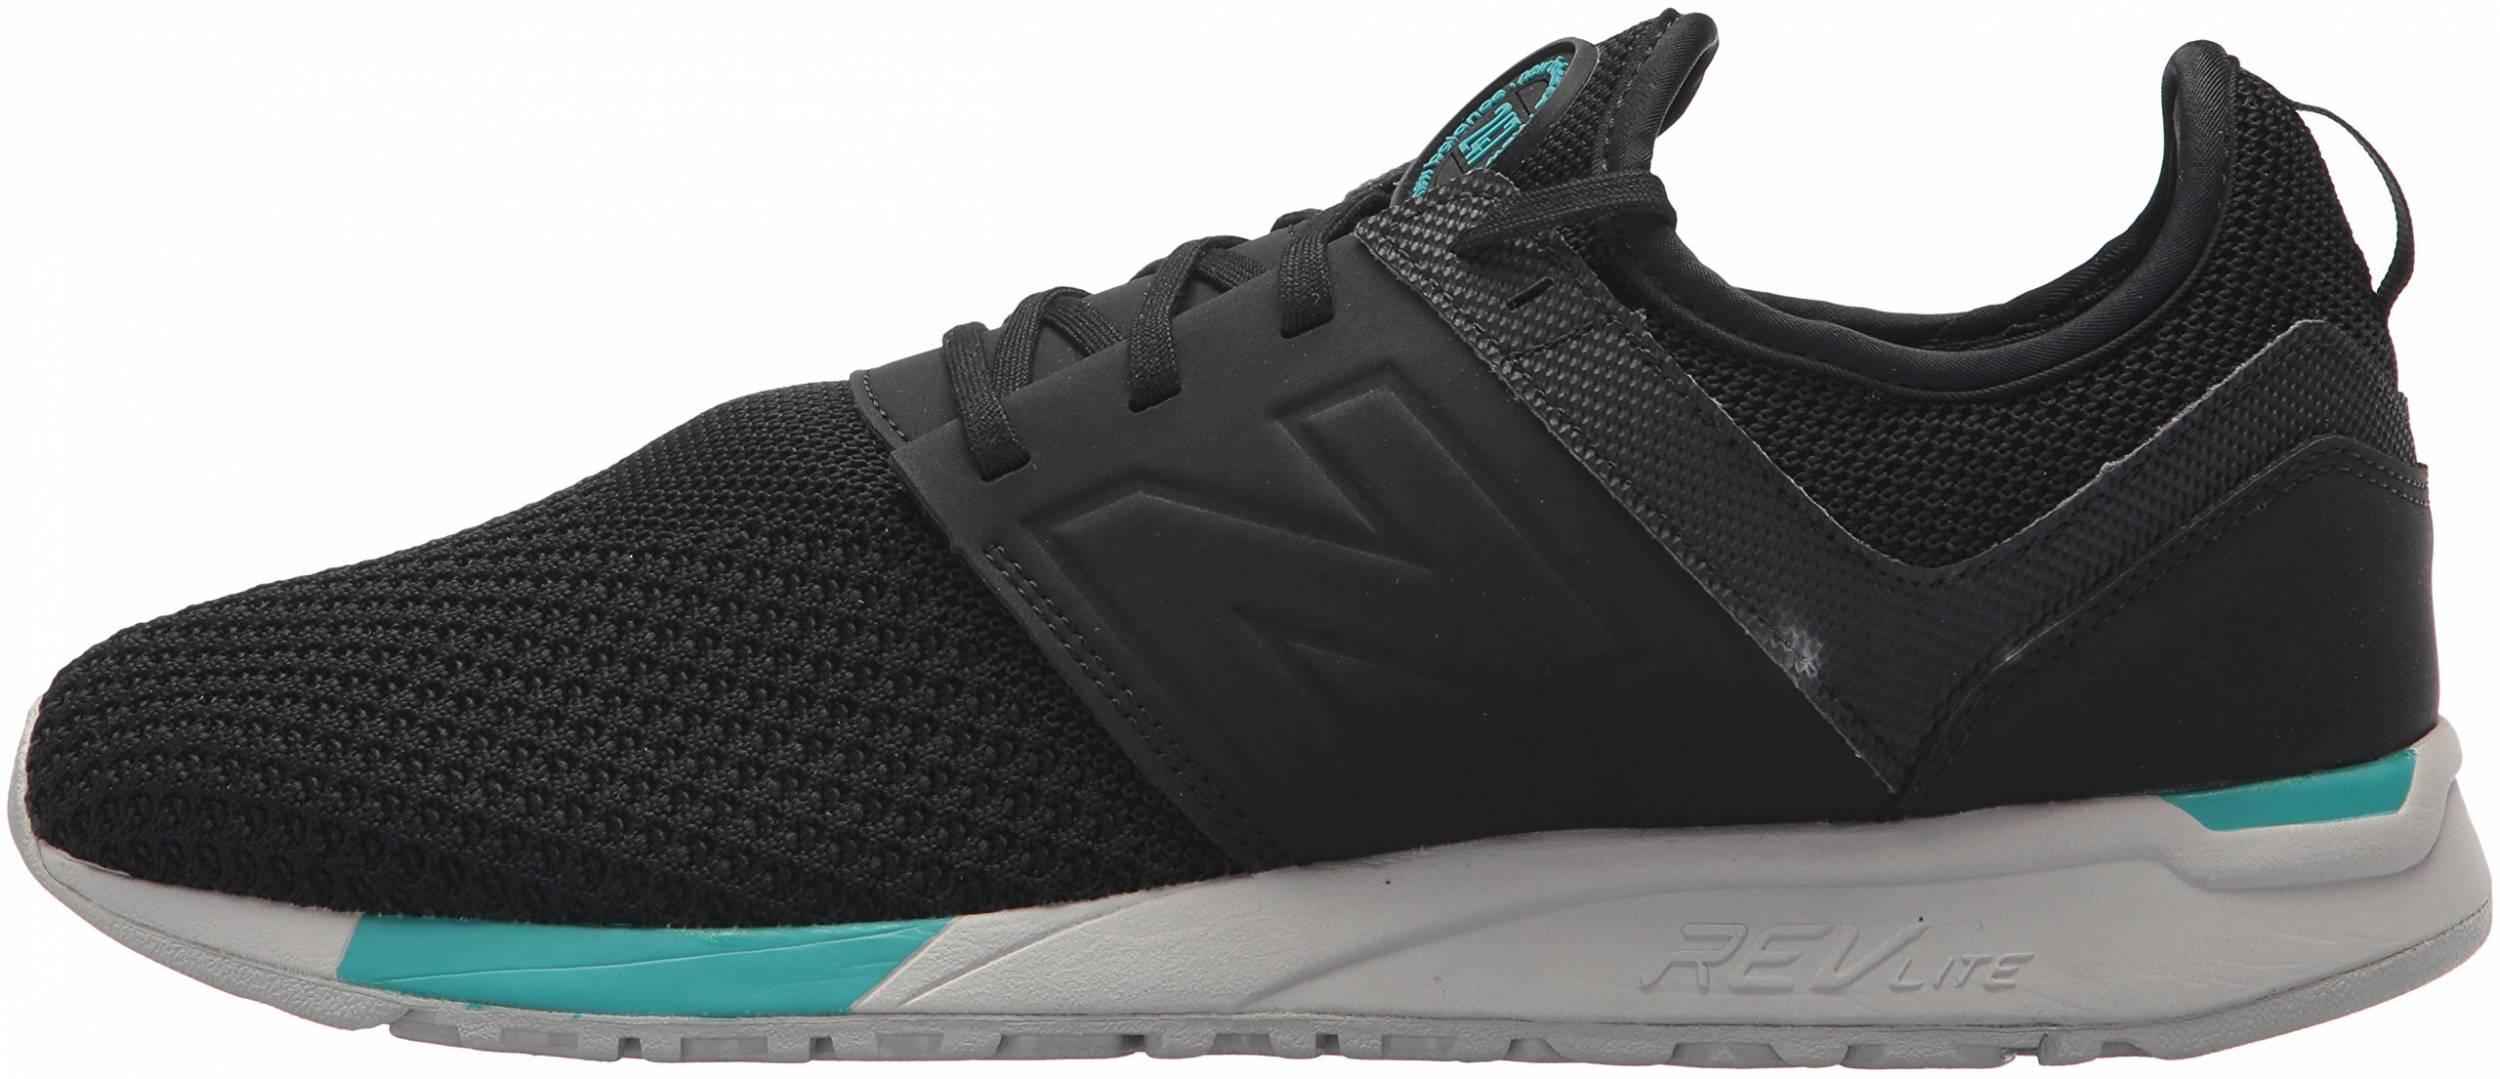 New Balance 247 Sport sneakers in black | RunRepeat